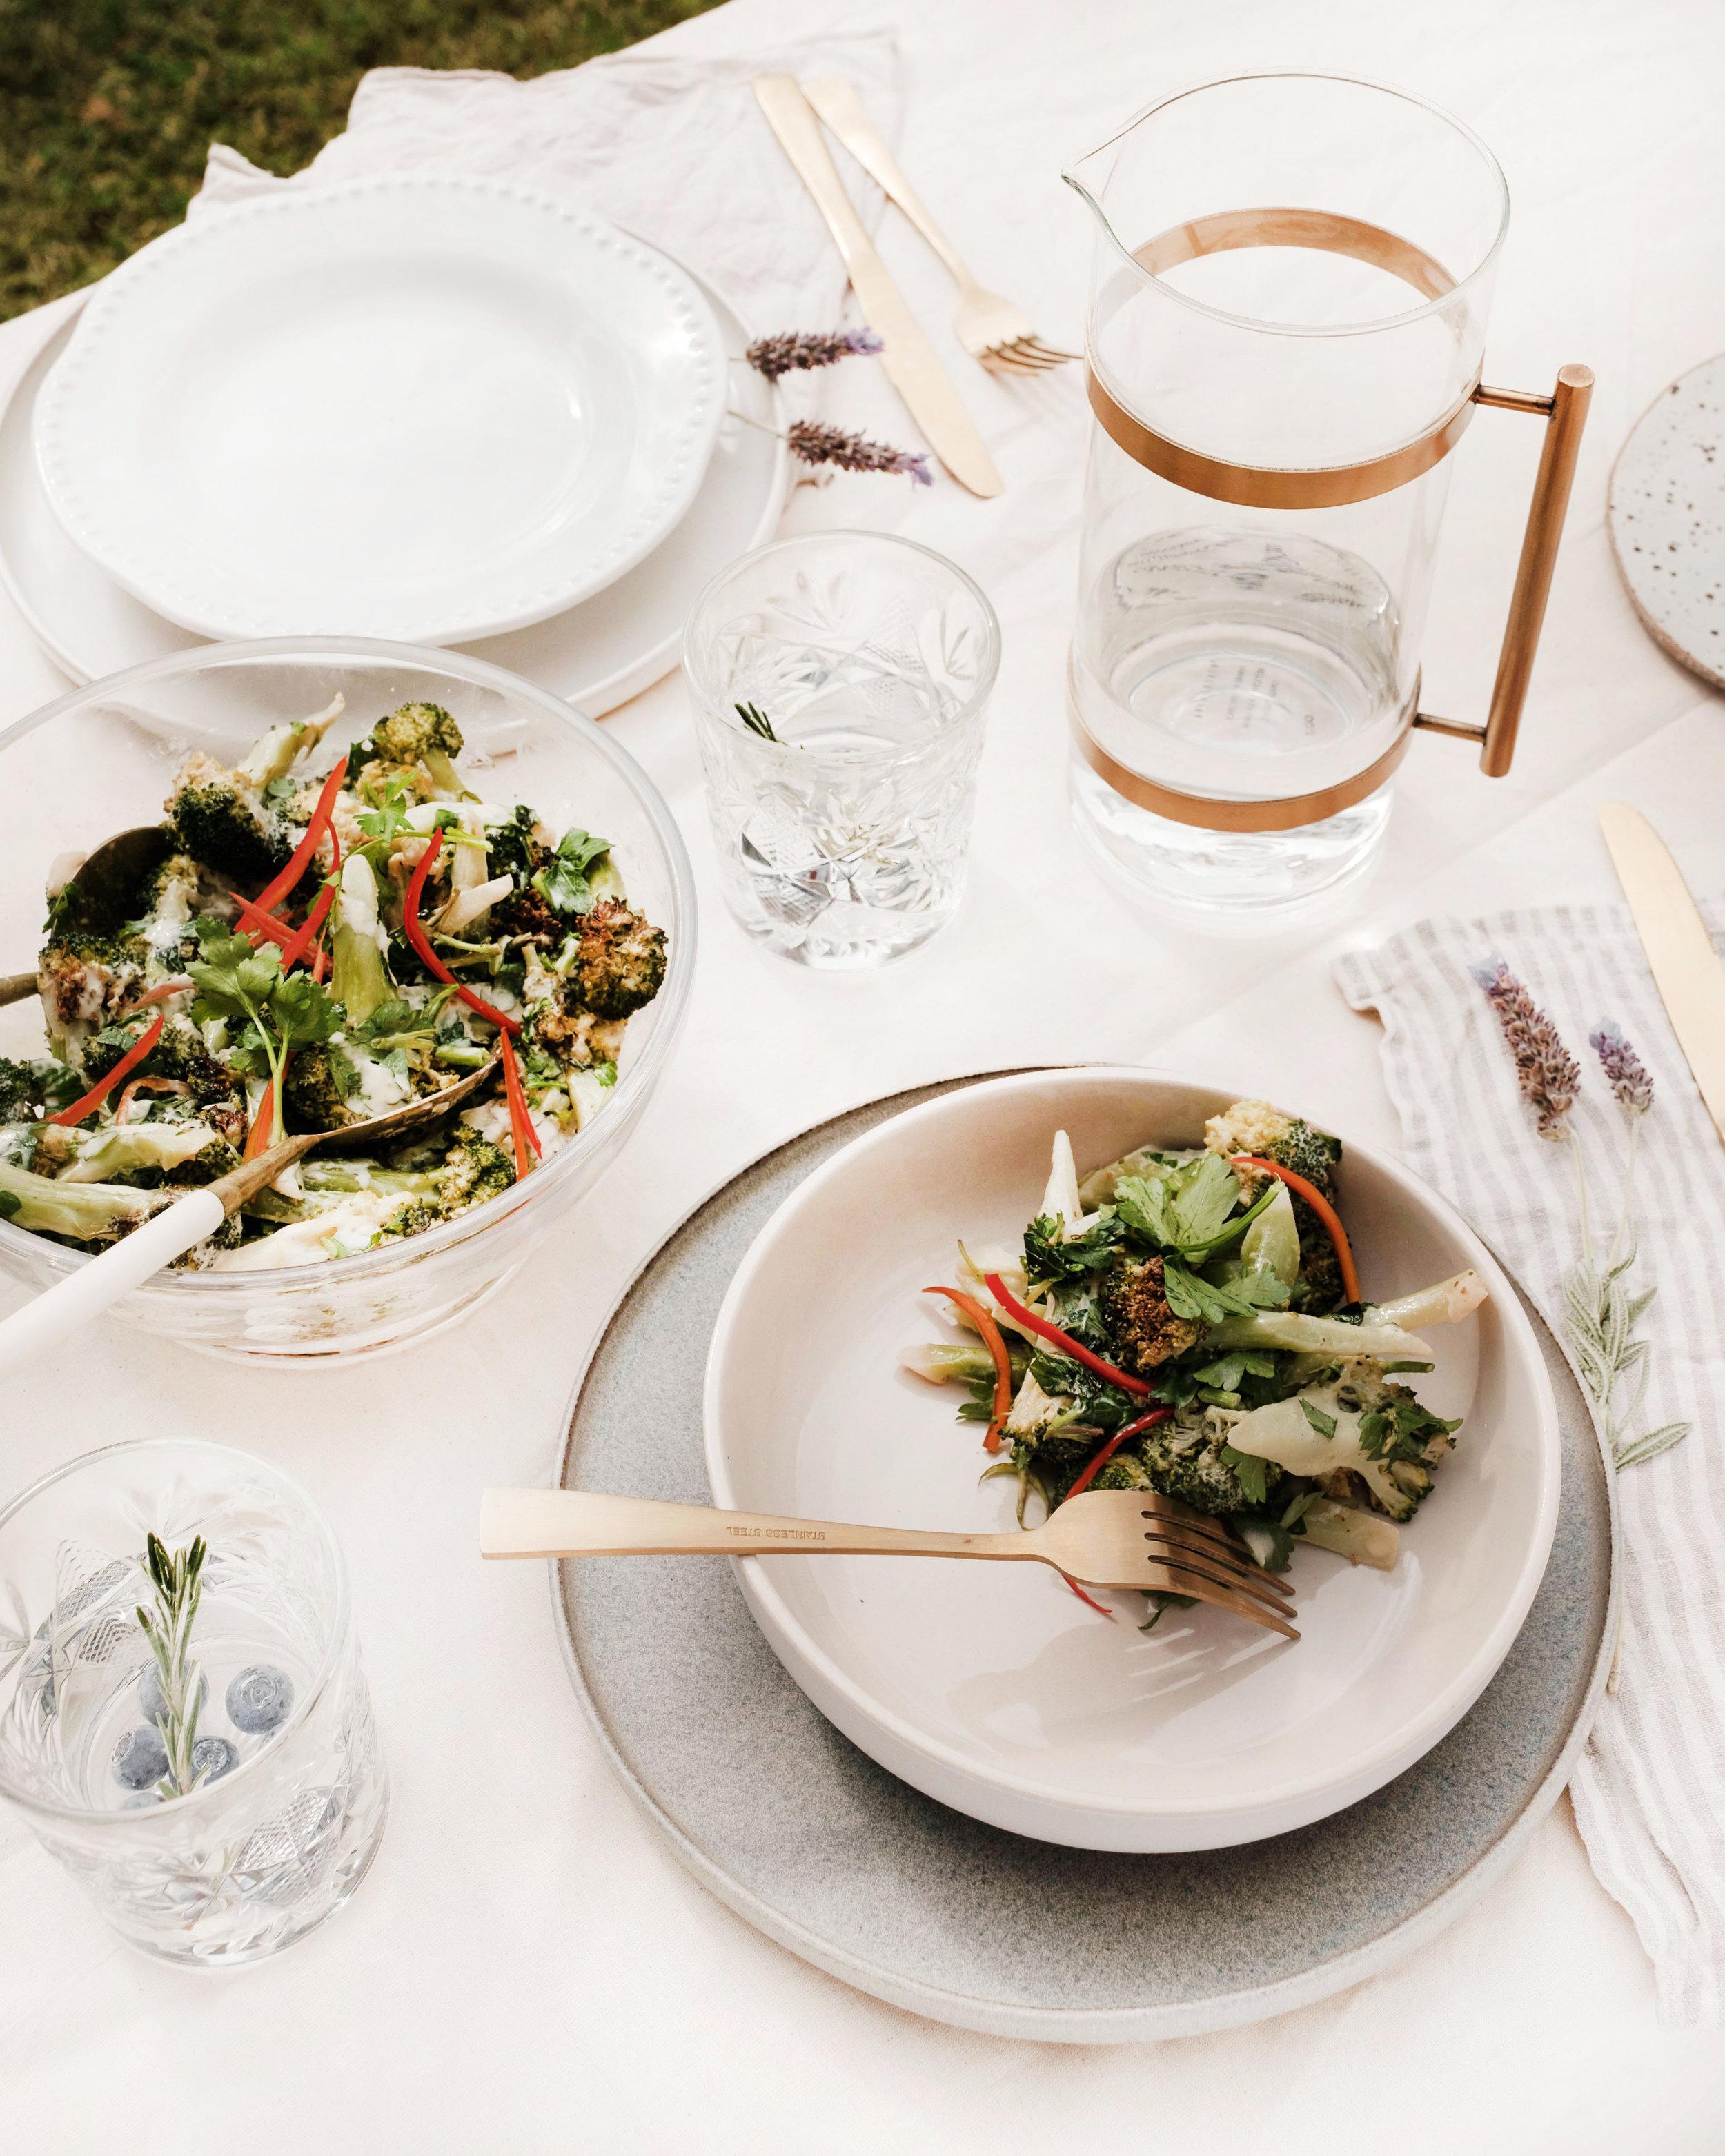 Botanica Jasmine Broc salad potrait.jpg